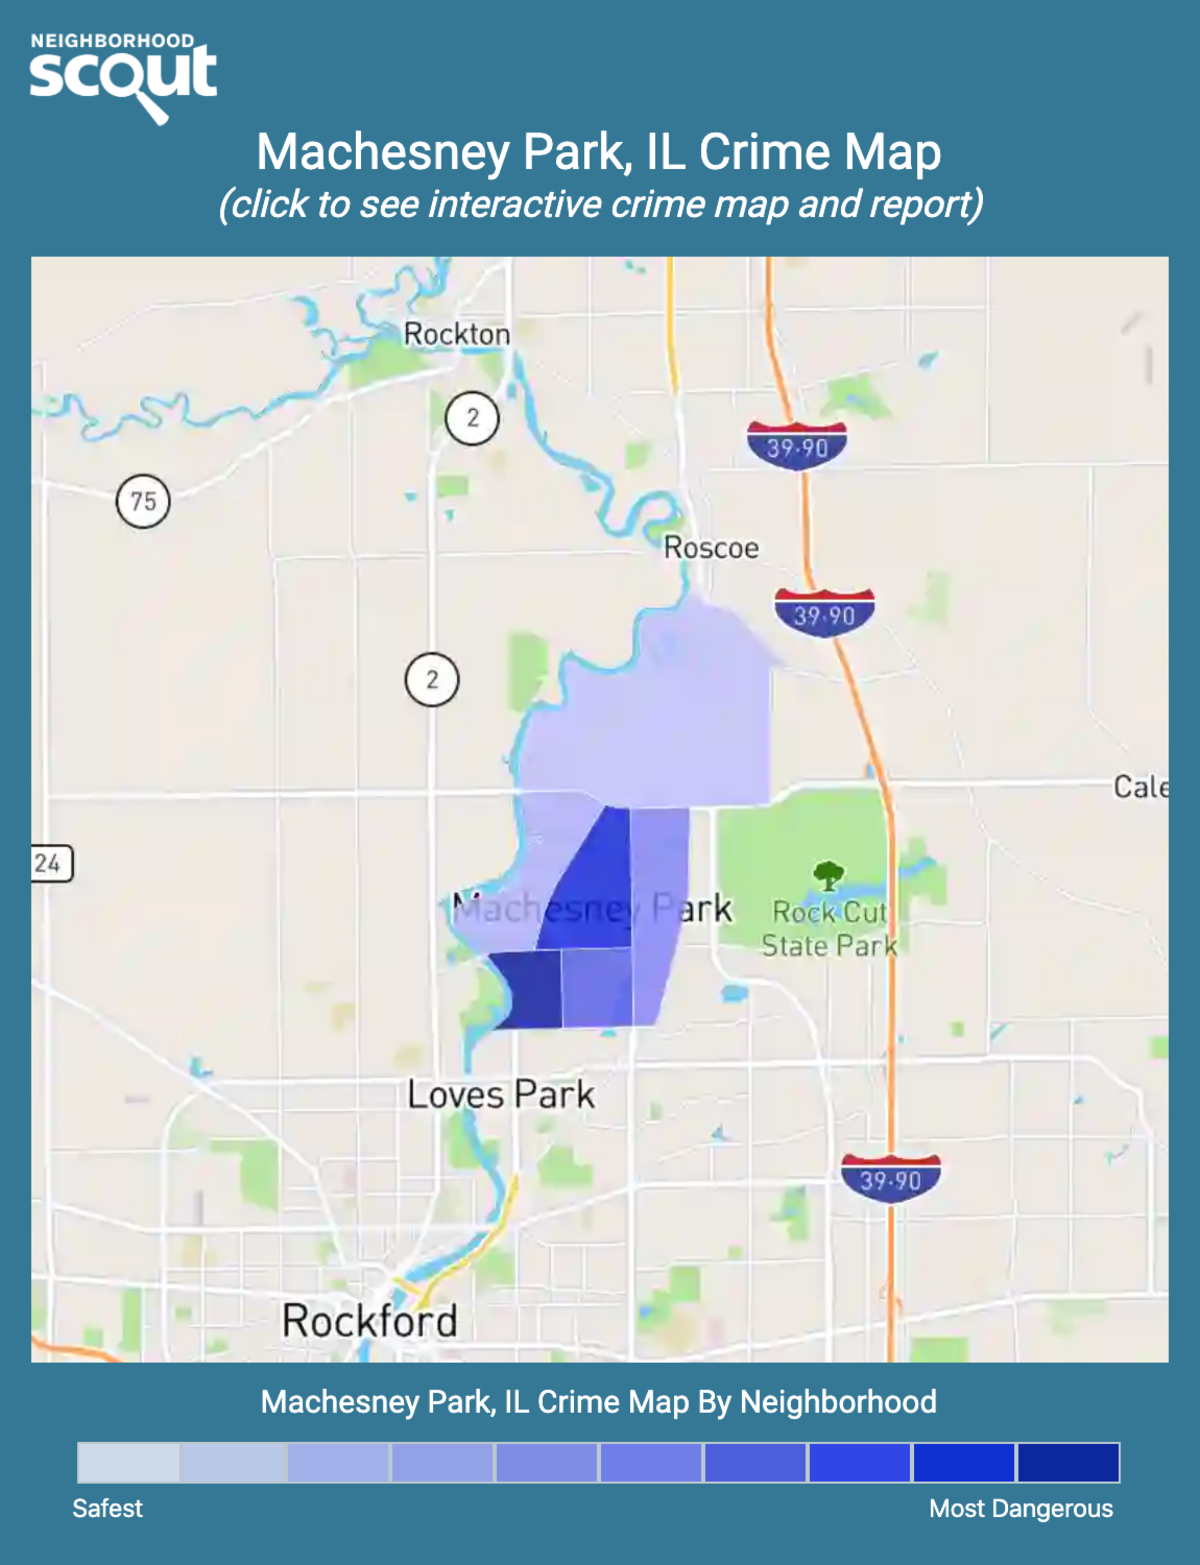 Machesney Park, Illinois crime map